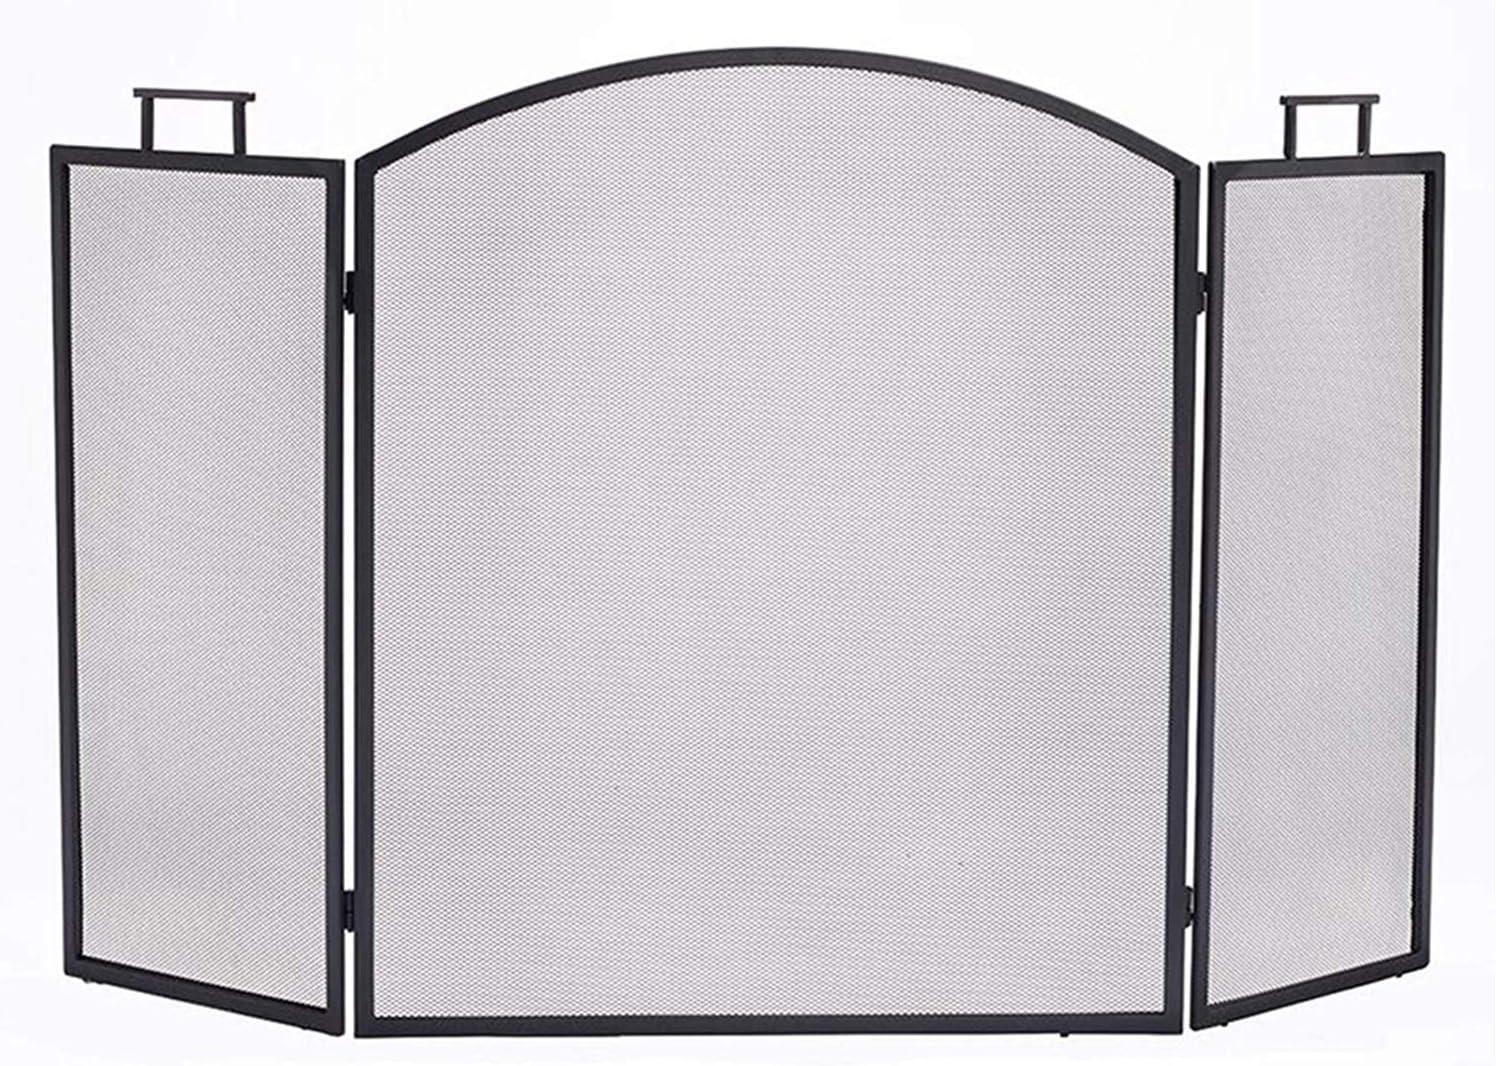 JIE KE Design Al sold out. Specialties 3-Panel Handle with Fireplace Under blast sales Screen